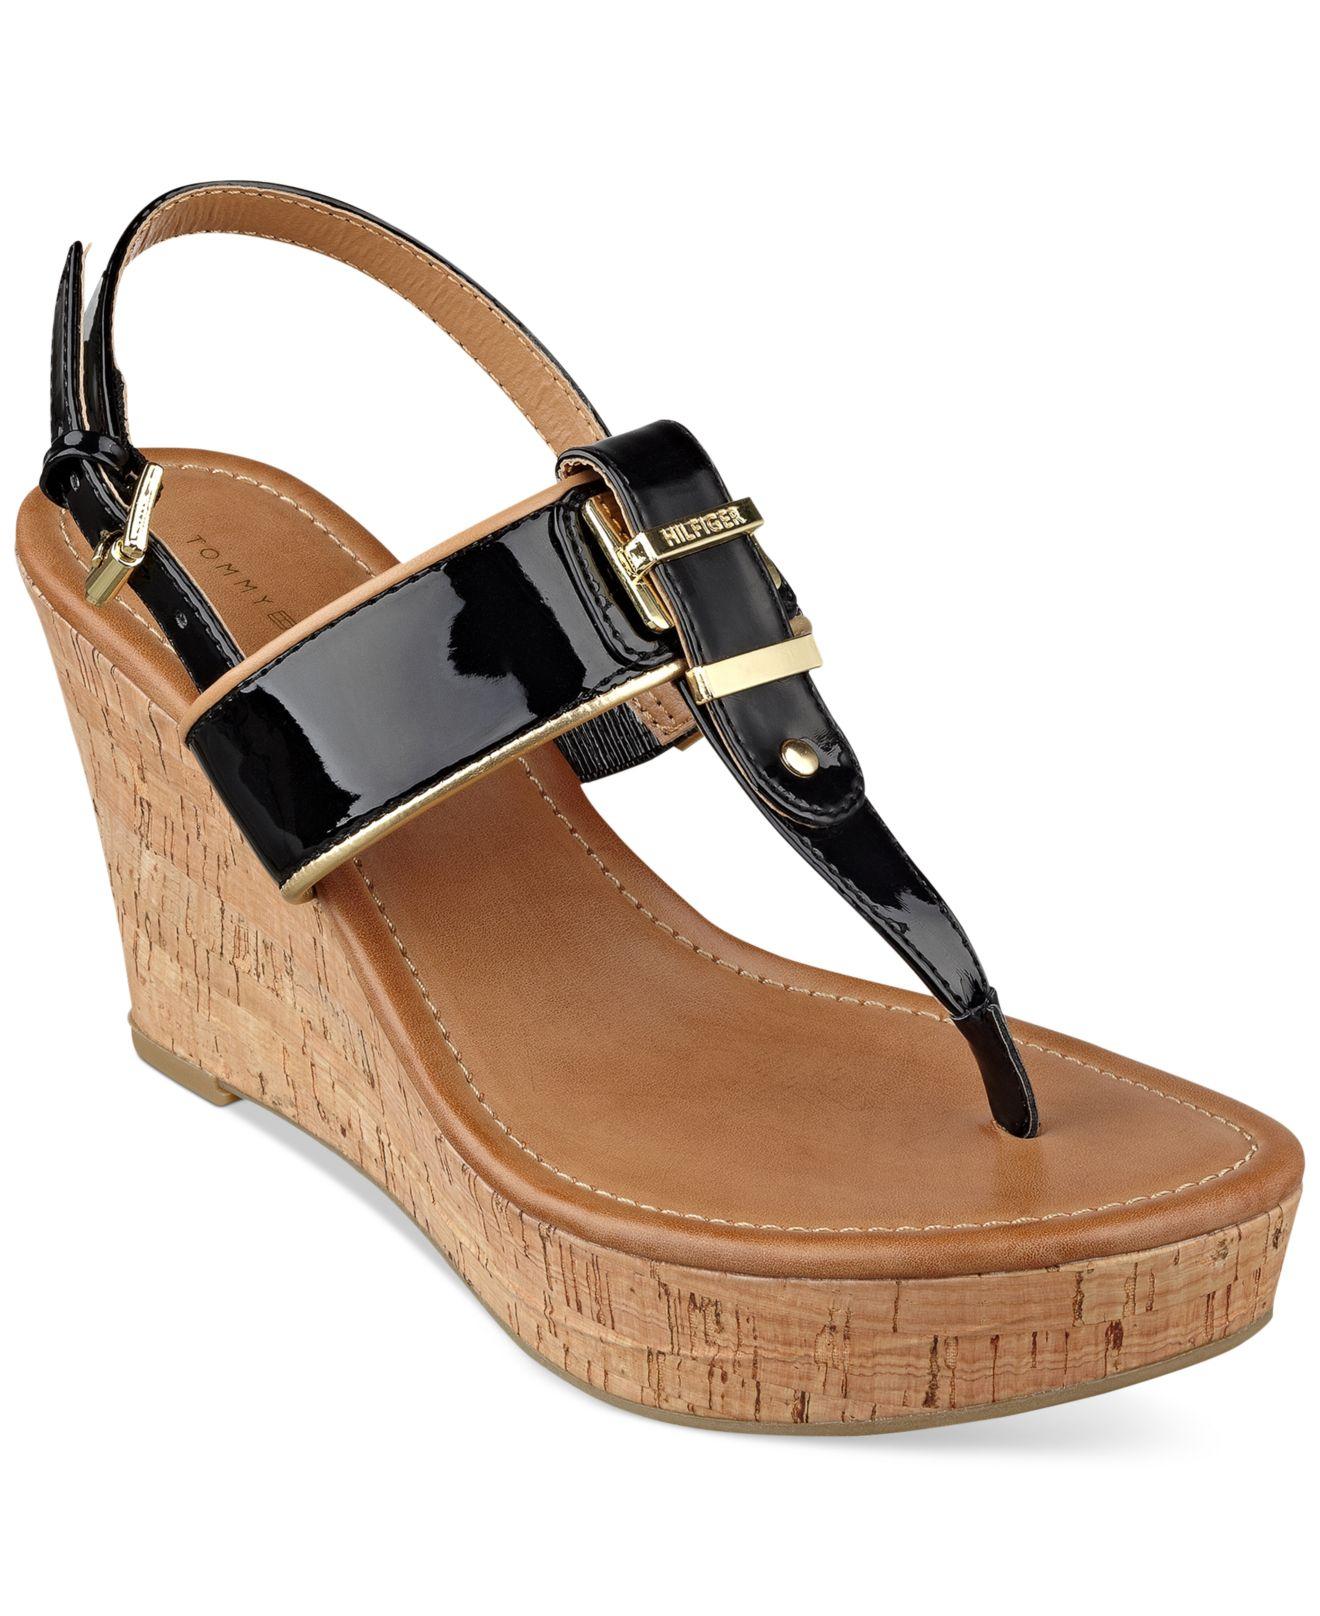 Original Tommy Hilfiger Women Sandals 2017